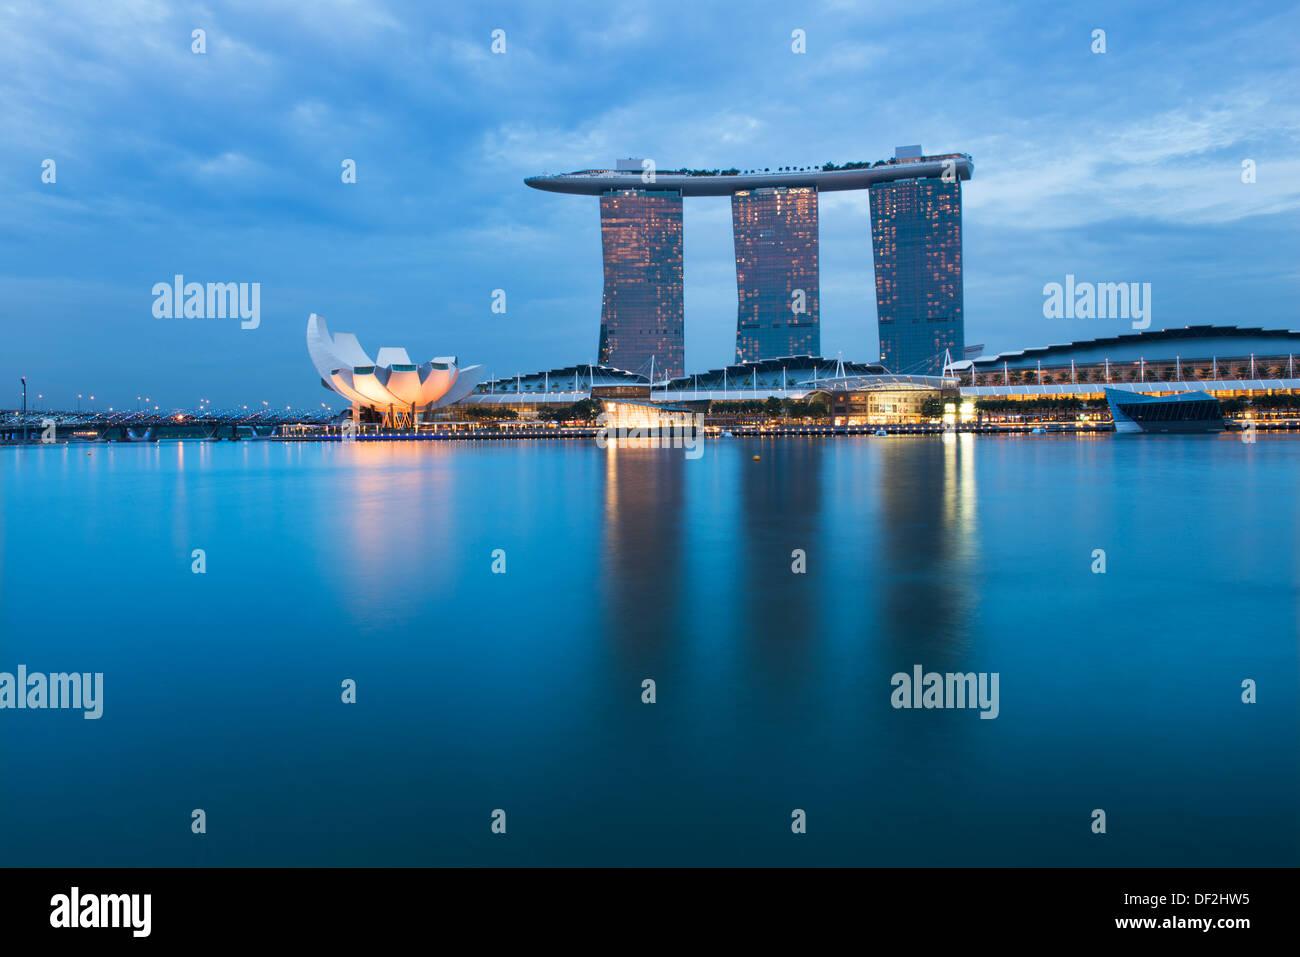 F1 Hotel Guide Singapore | Grand Prix Events Hospitality